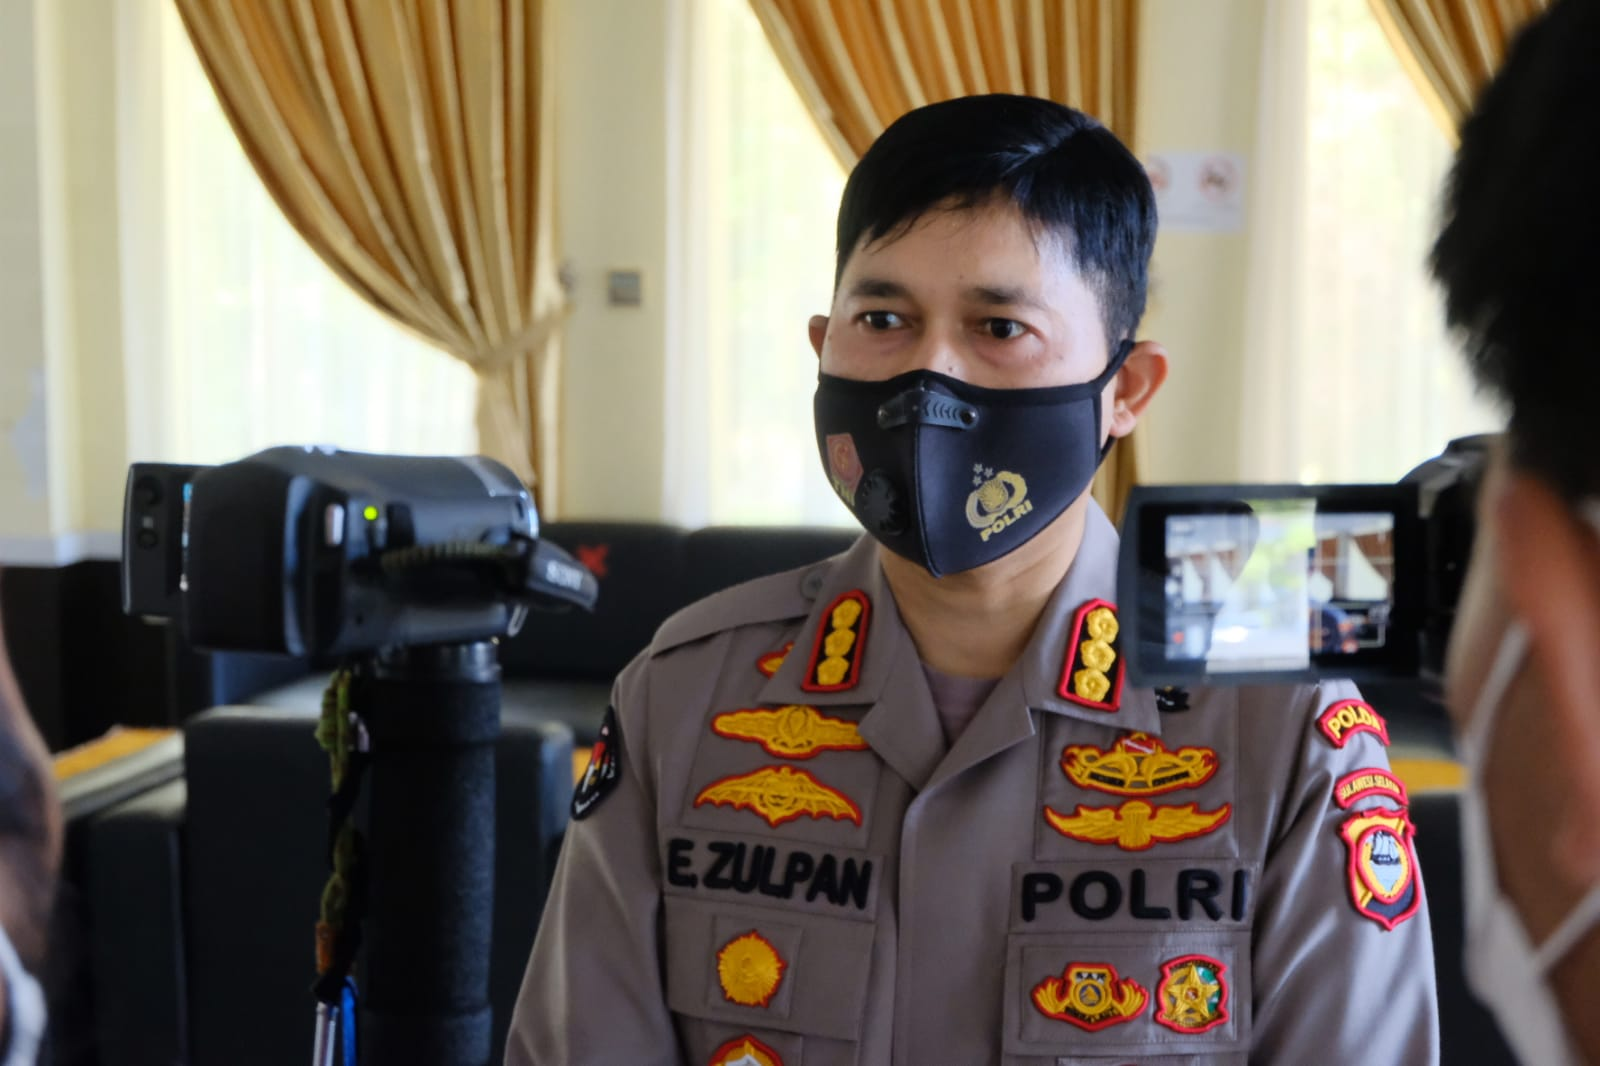 Kabidhumas Polda Sulsel: Operasi Patuh 2021, Personil Polda Sulsel Bagi Sembako, Beri Edukasi Prokes Dan Aturan Berlalu Lintas